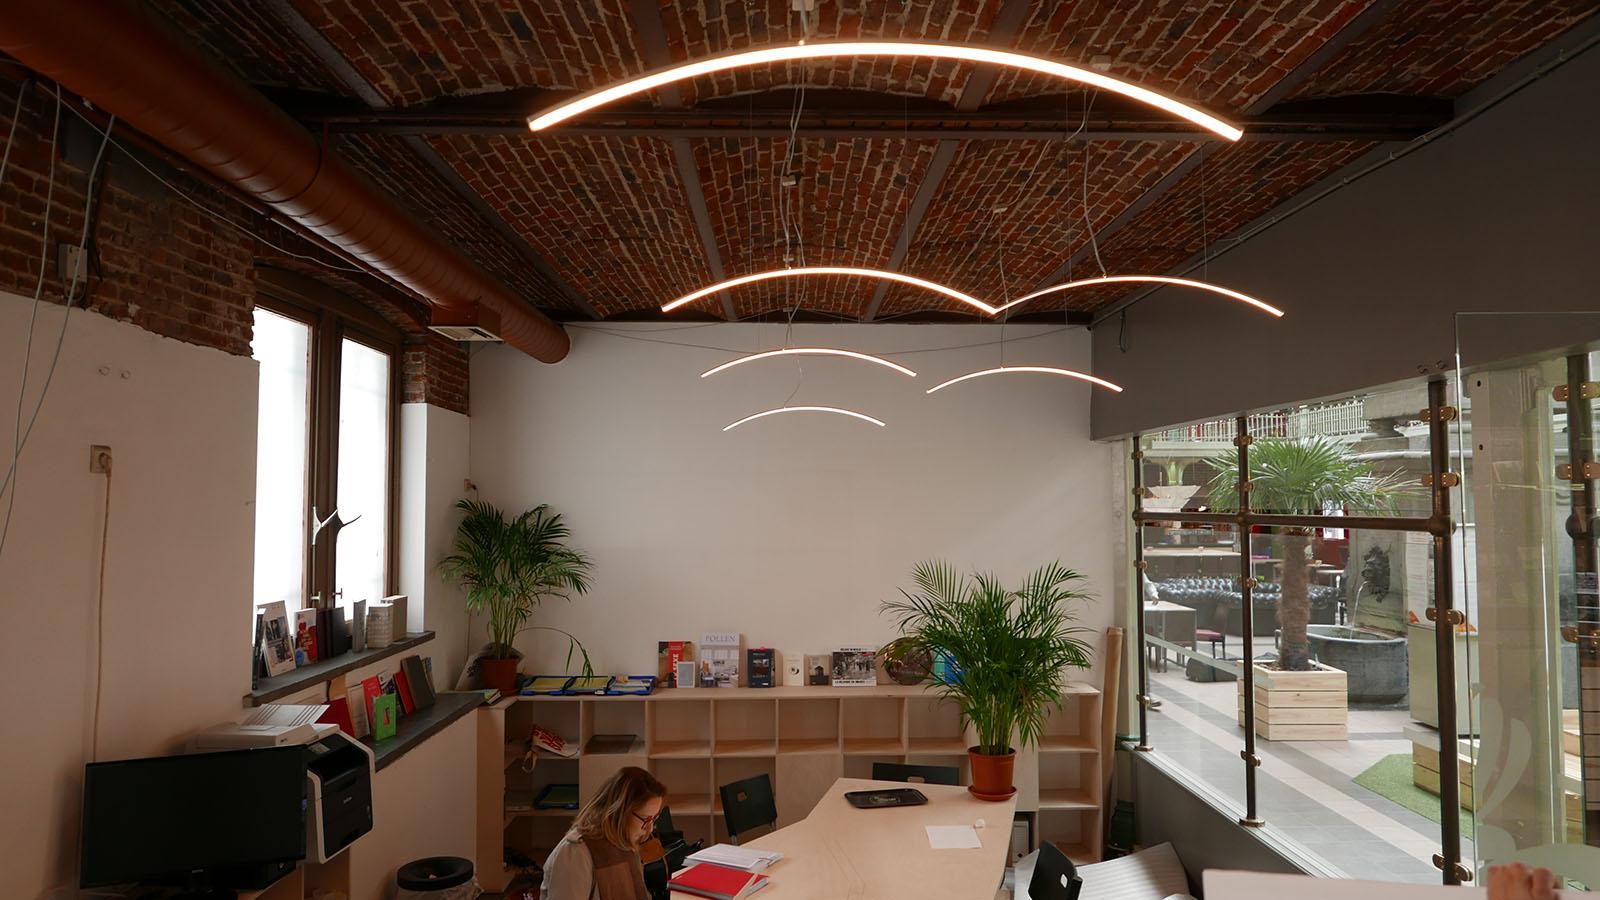 bureau global design for halles saint gry office custom design and furniture production table bookcases sofa lights - Bureau Design